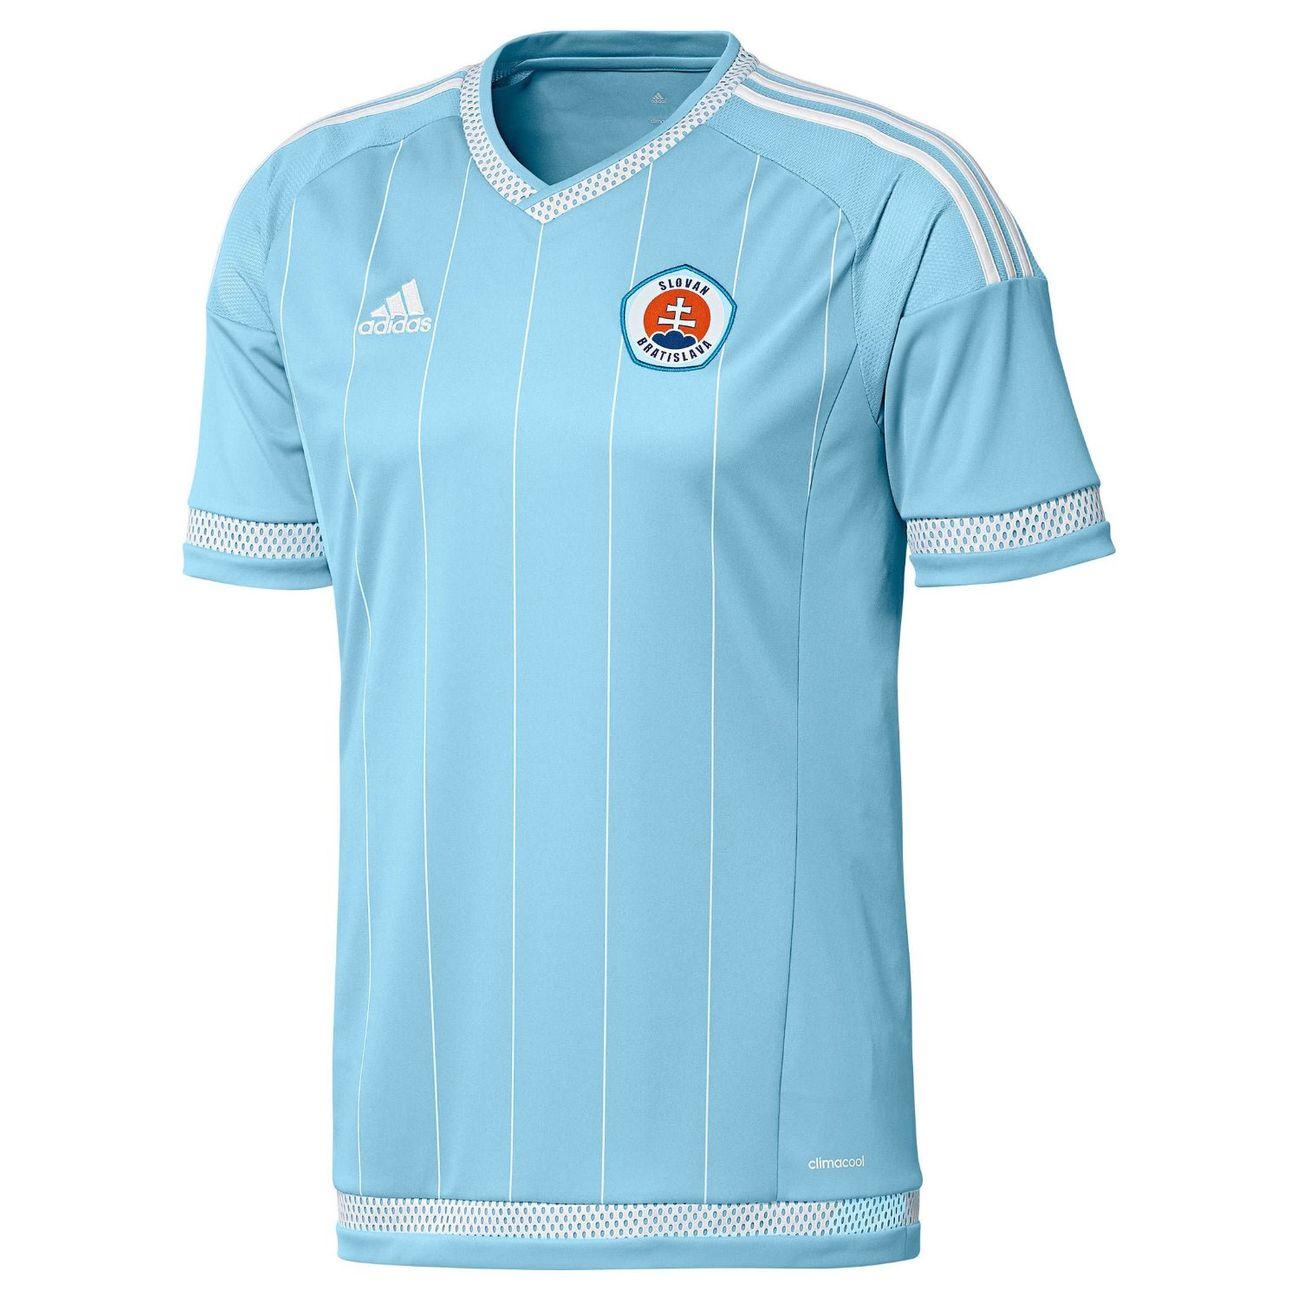 Slovan Bratislava 2016 Maillot Domicile Adidas 2015 Football a48qw5g